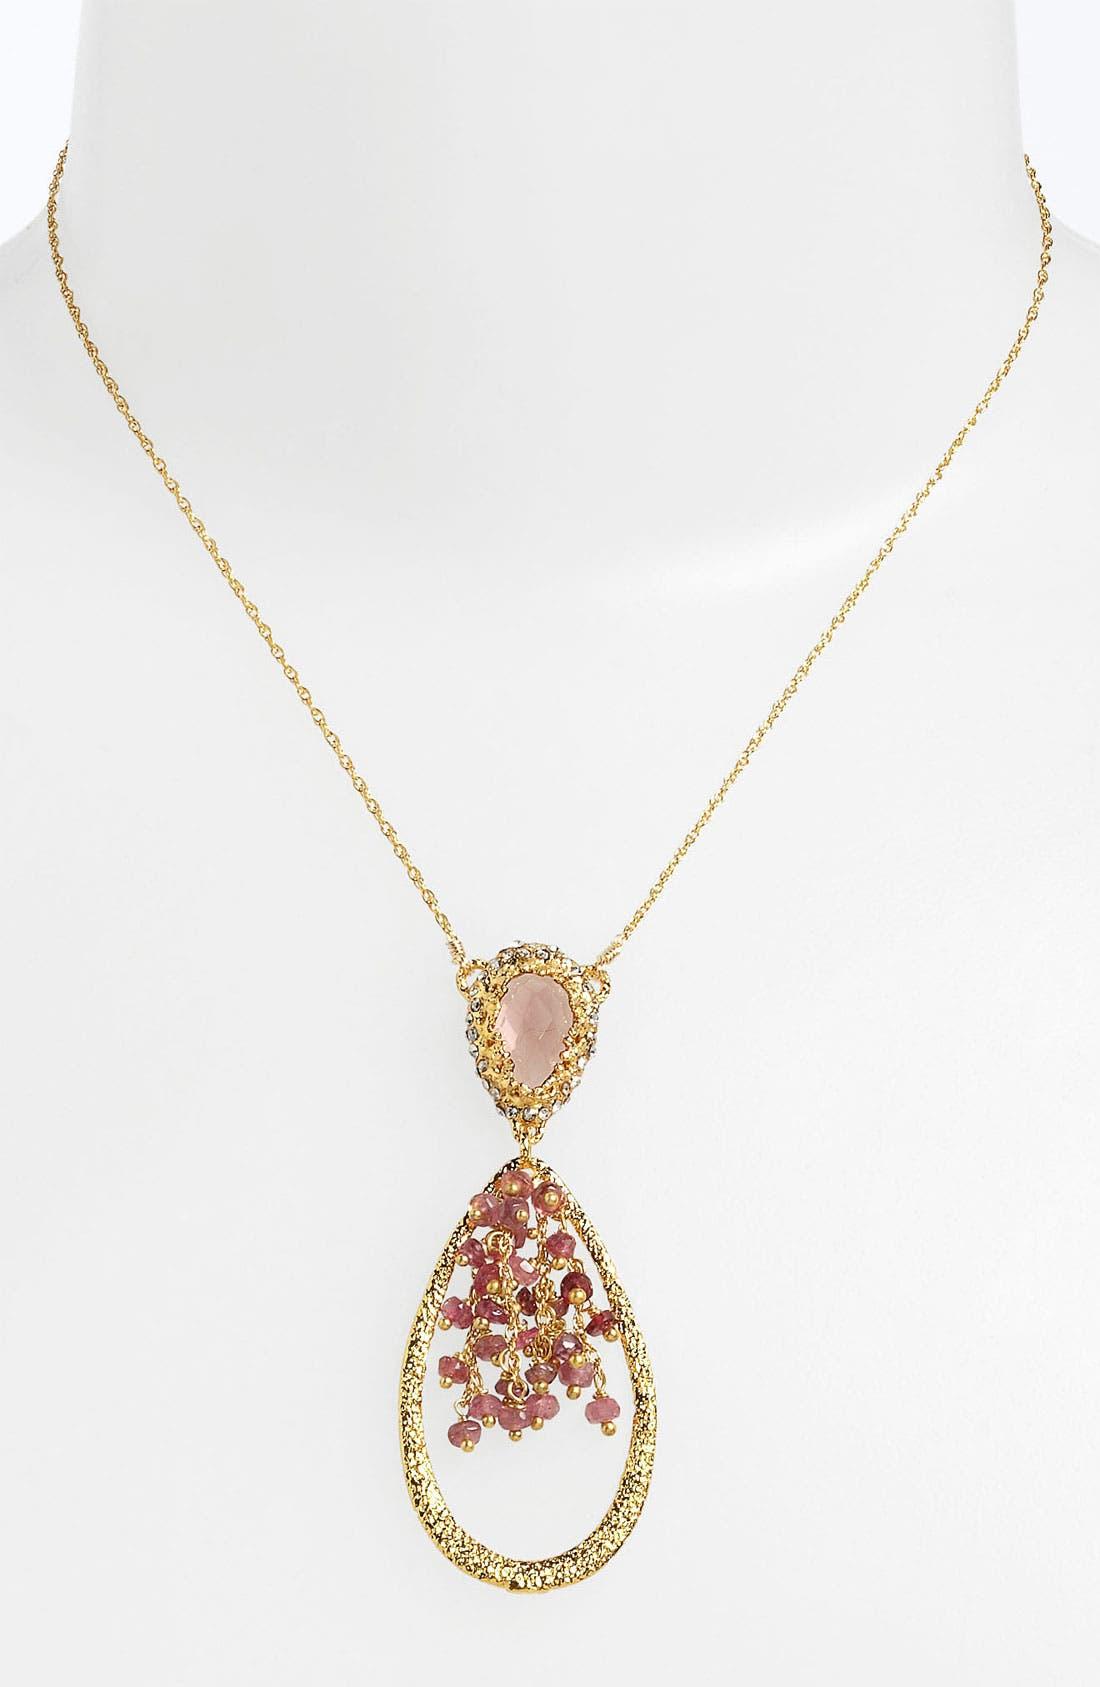 Main Image - Alexis Bittar 'Elements - Floral' Teardrop Pendant Necklace